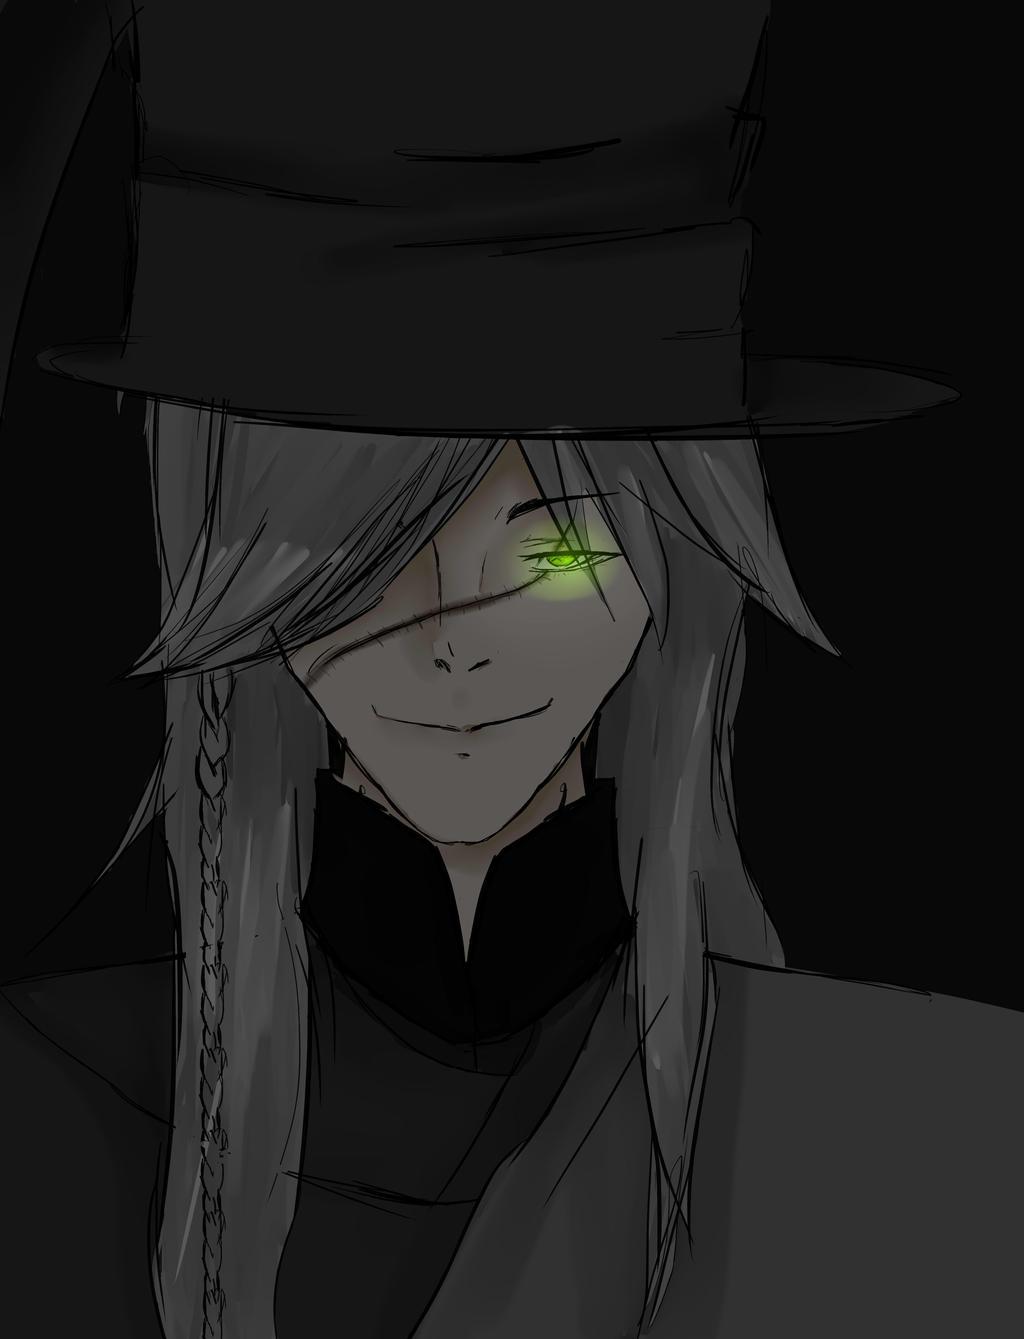 Undertaker Back Butler/kuroshitsuji by Cyborgclips